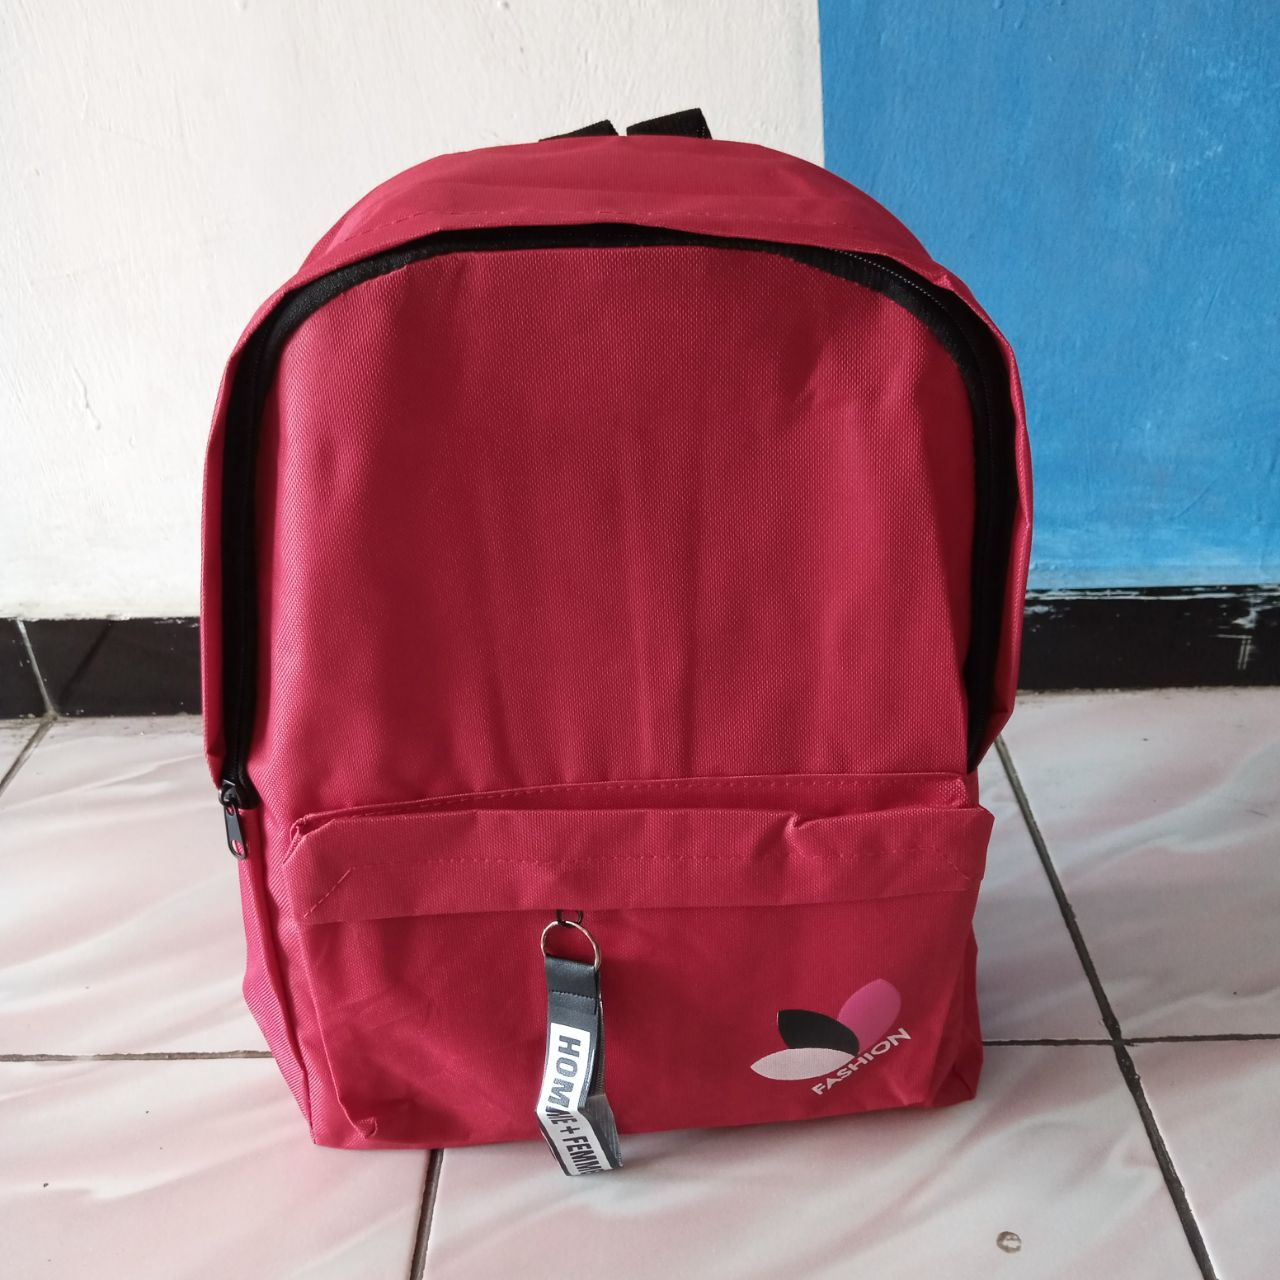 ini adalah Tas Feme Merah, size: 23 cm x 14 cm , material: canvas, color: red, brand: tasranselindonesia, age_group: all ages, gender: unisex